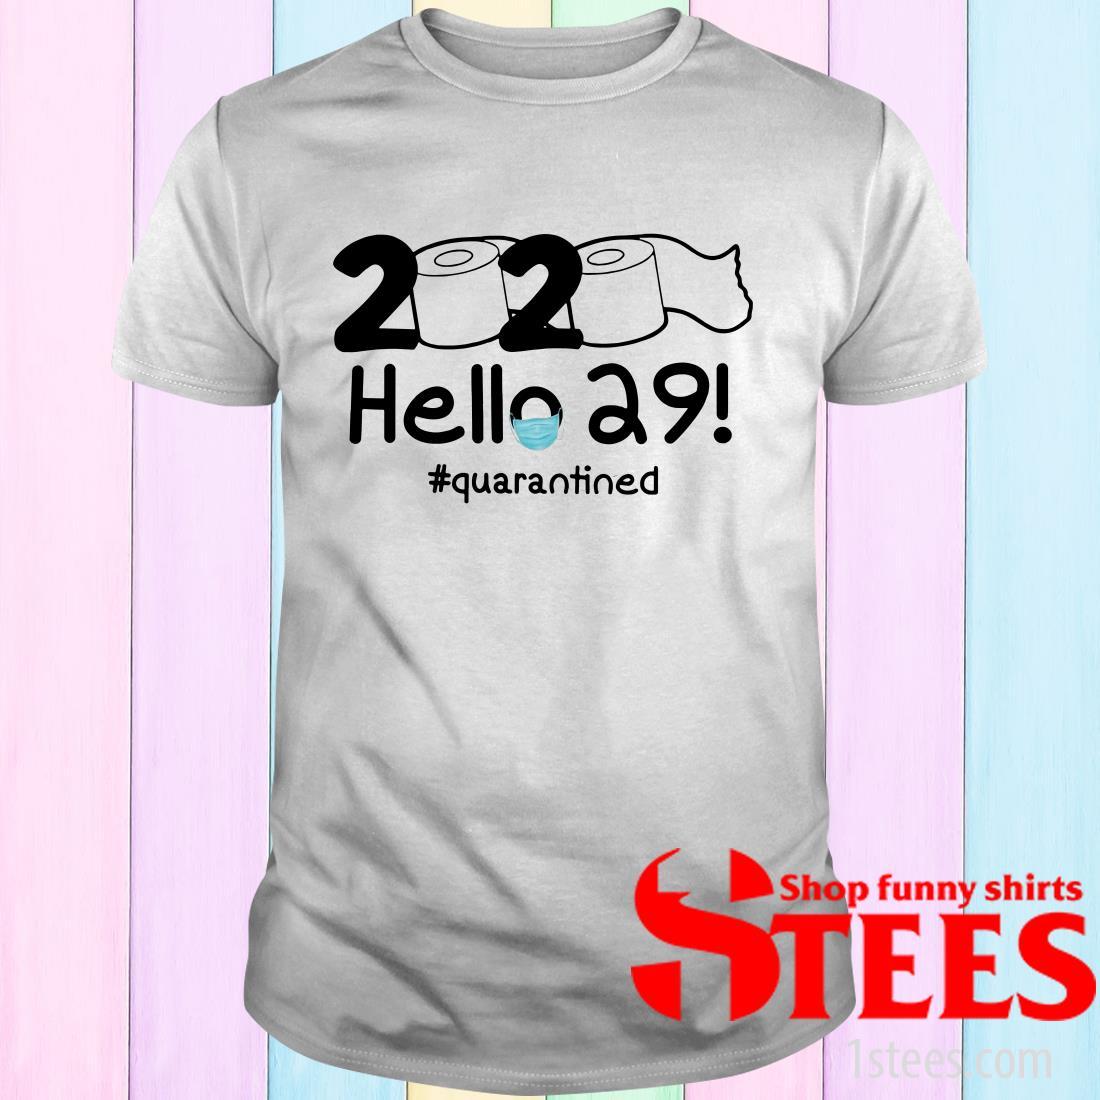 2020 Hello 29 #Quarantined Shirt